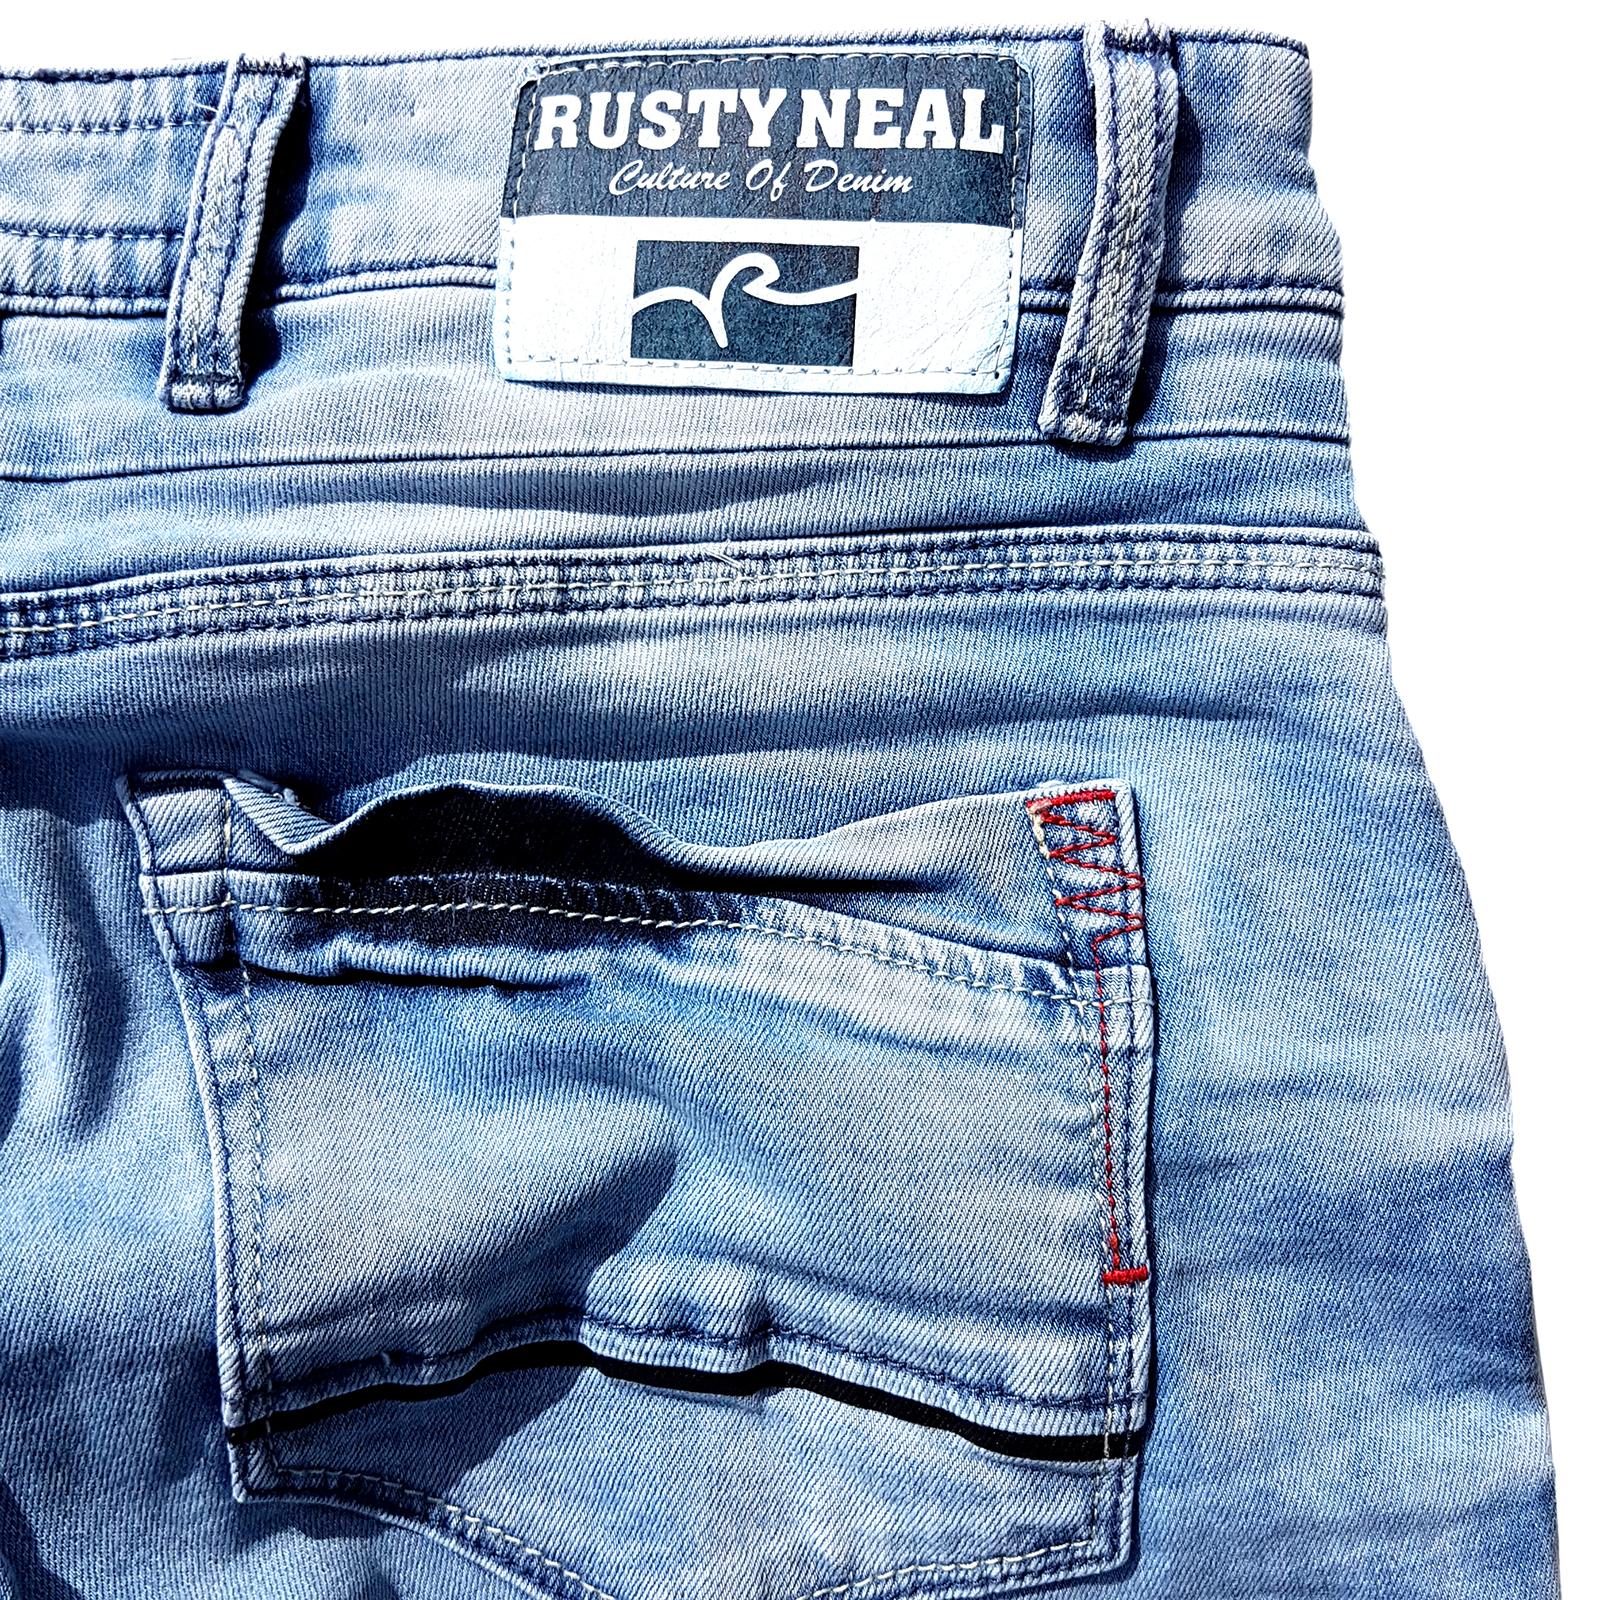 Kurze Jeans Hose Herren Shorts Pants Mix136 Rusty Neal